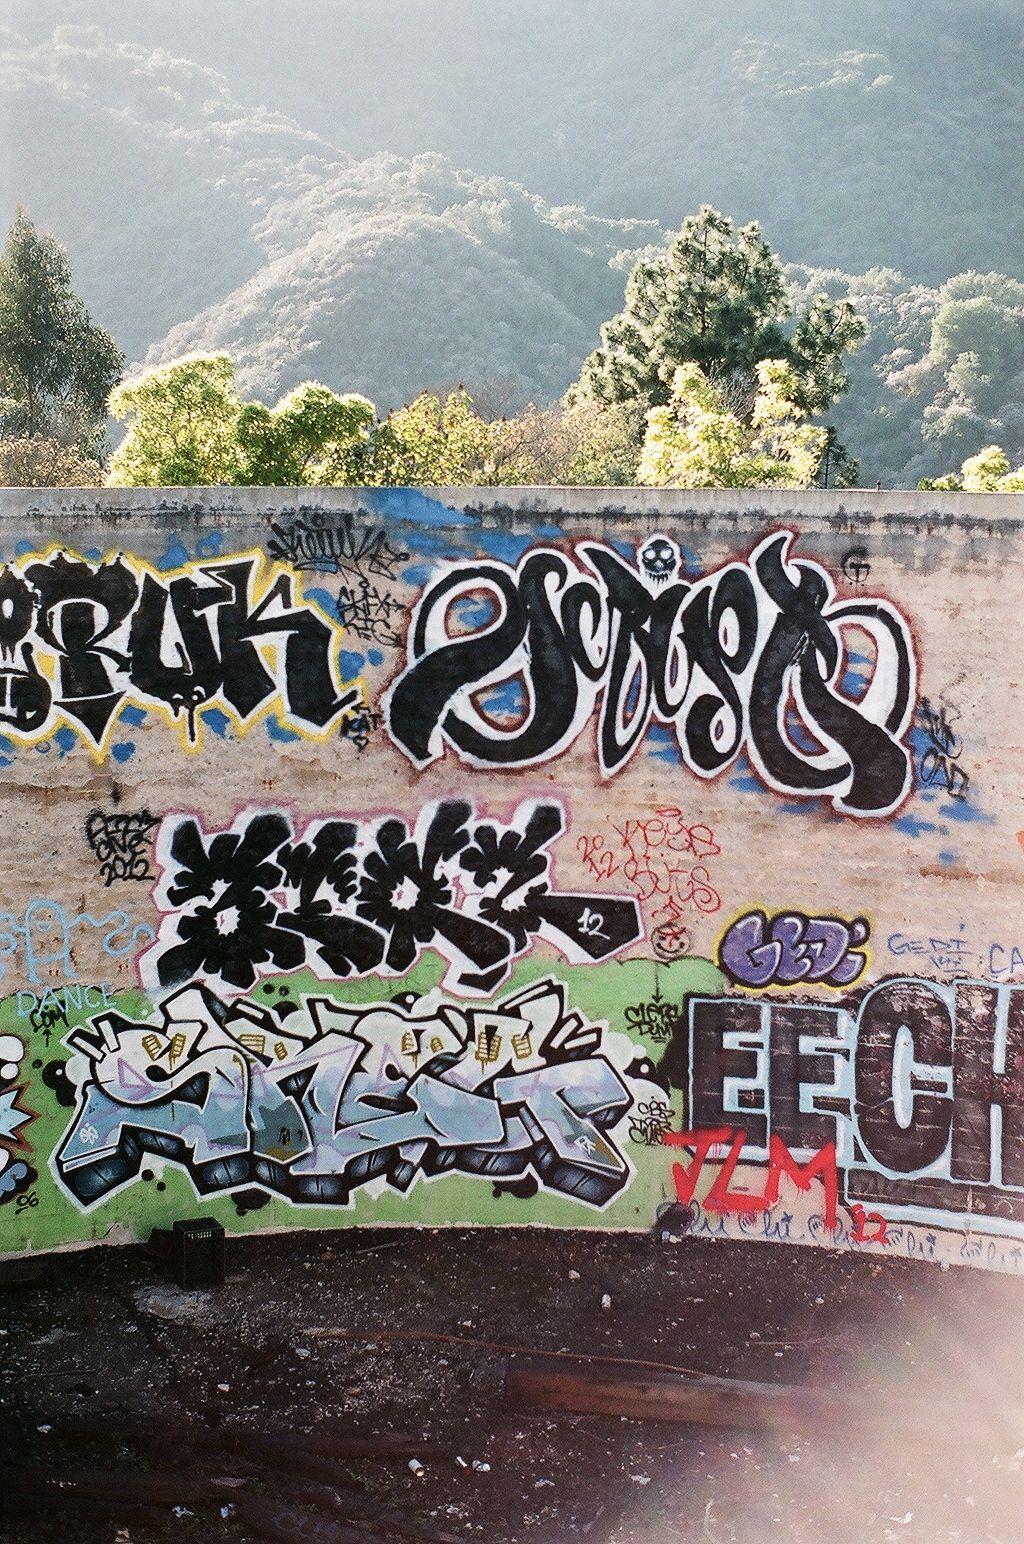 Graffiti hike : Los Angeles | photothentic.com | Wazer | Pinterest ...